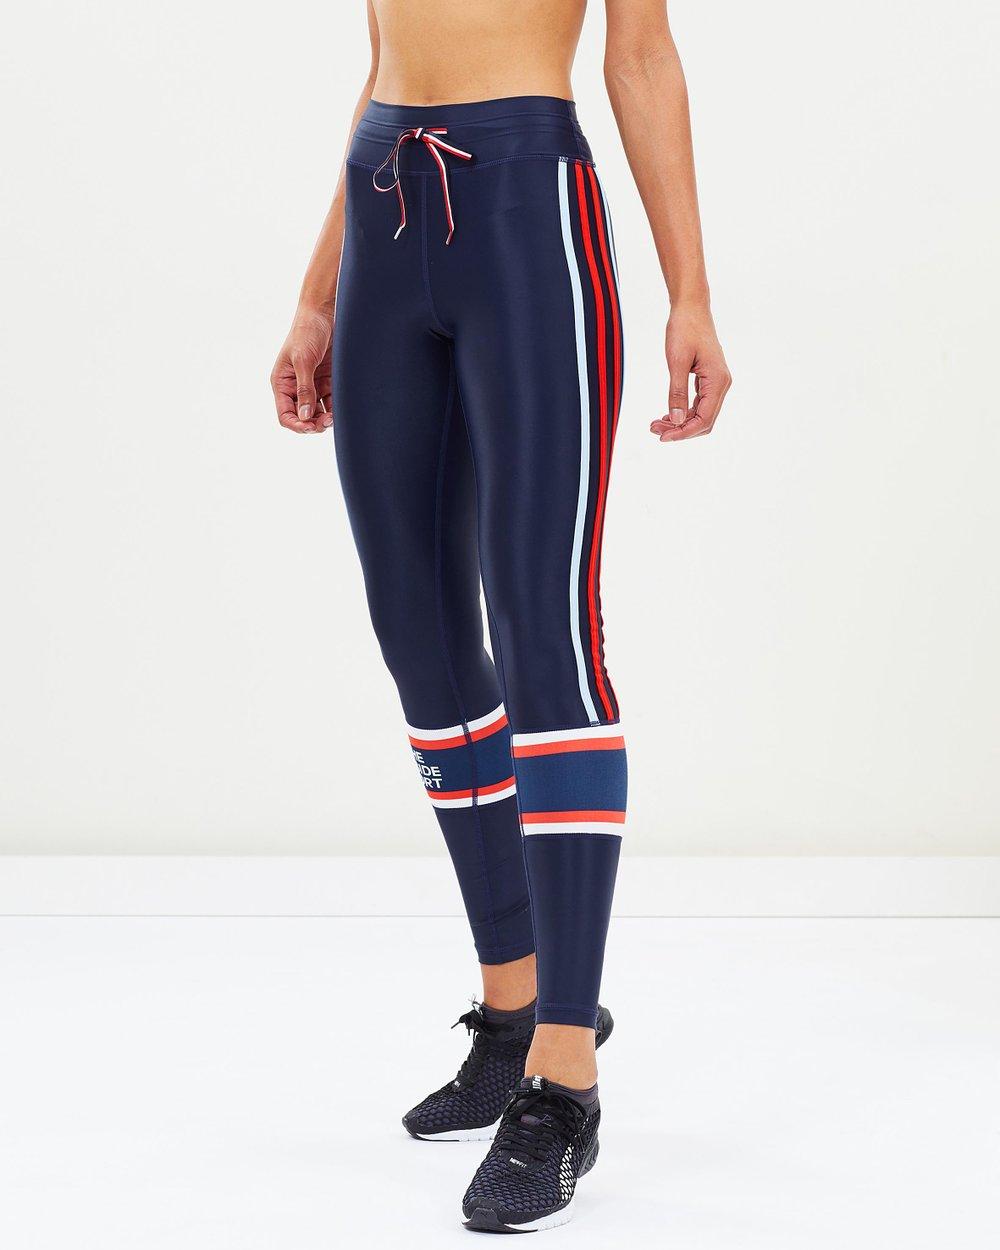 cf84f989fb9a99 Makeba Yoga Pants by The Upside Online | THE ICONIC | Australia